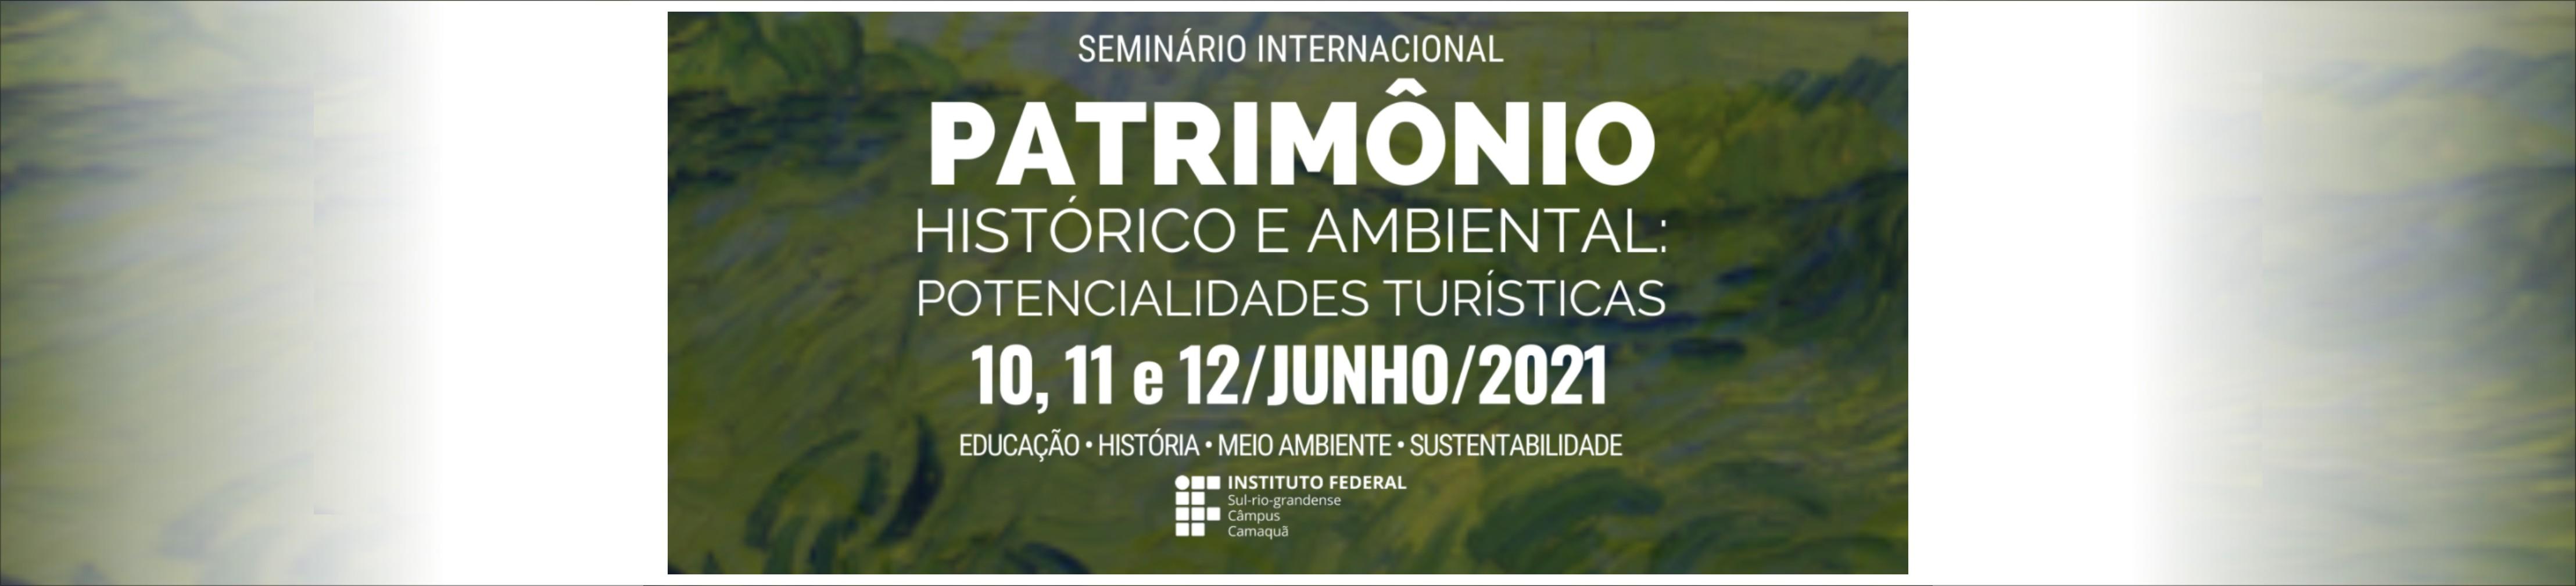 Seminário Internacional Patrimônio Histórico e Ambiental: Potencialidades Turísticas